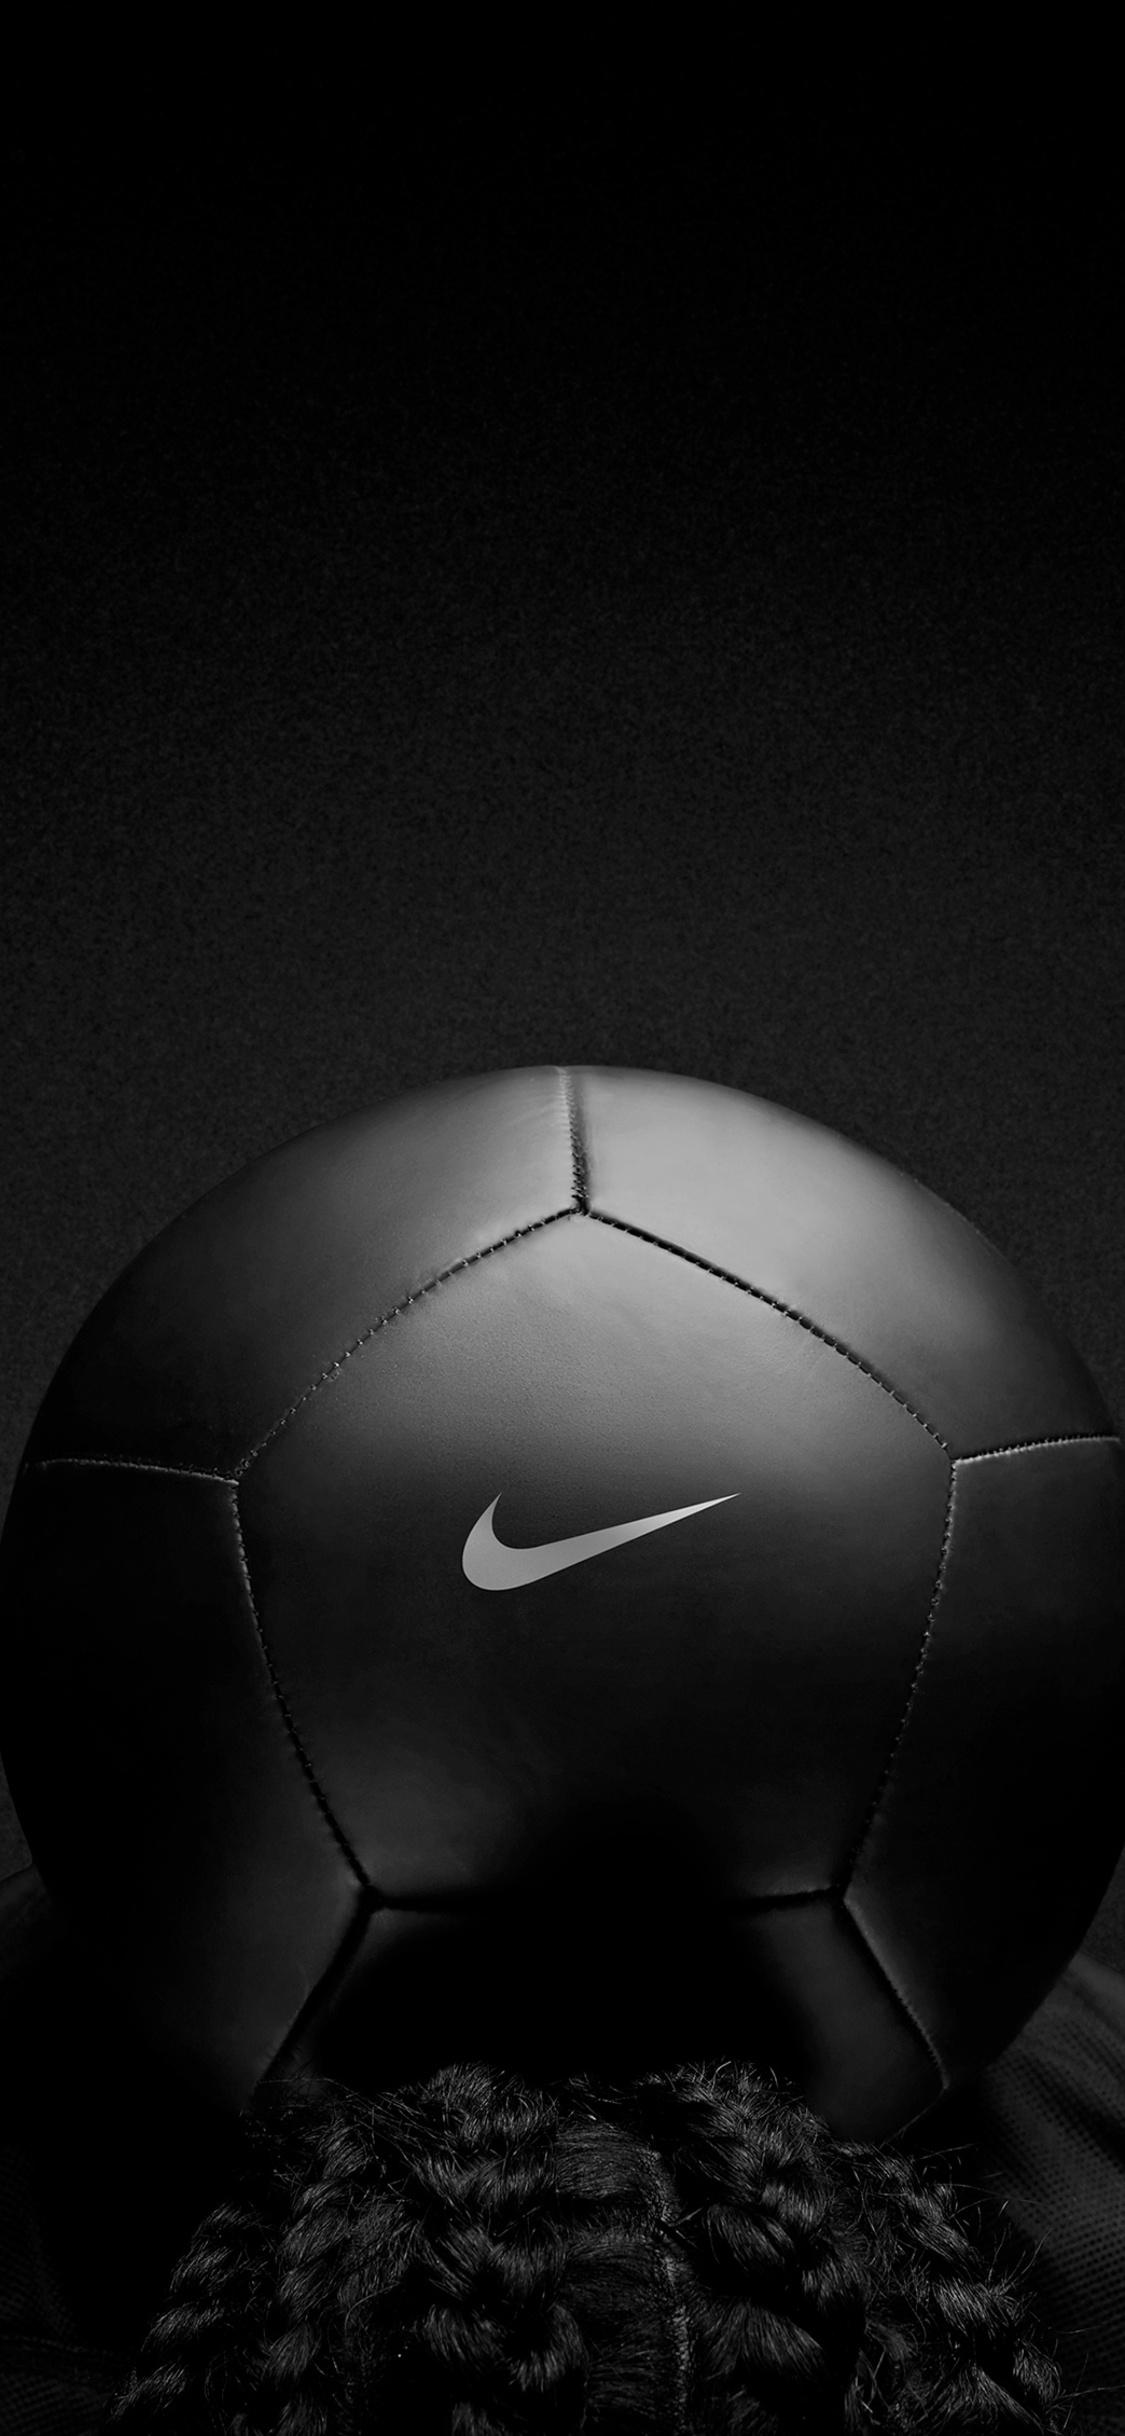 1125x2436 Nike Black Play Football Iphone Xs Iphone 10 Iphone X Hd